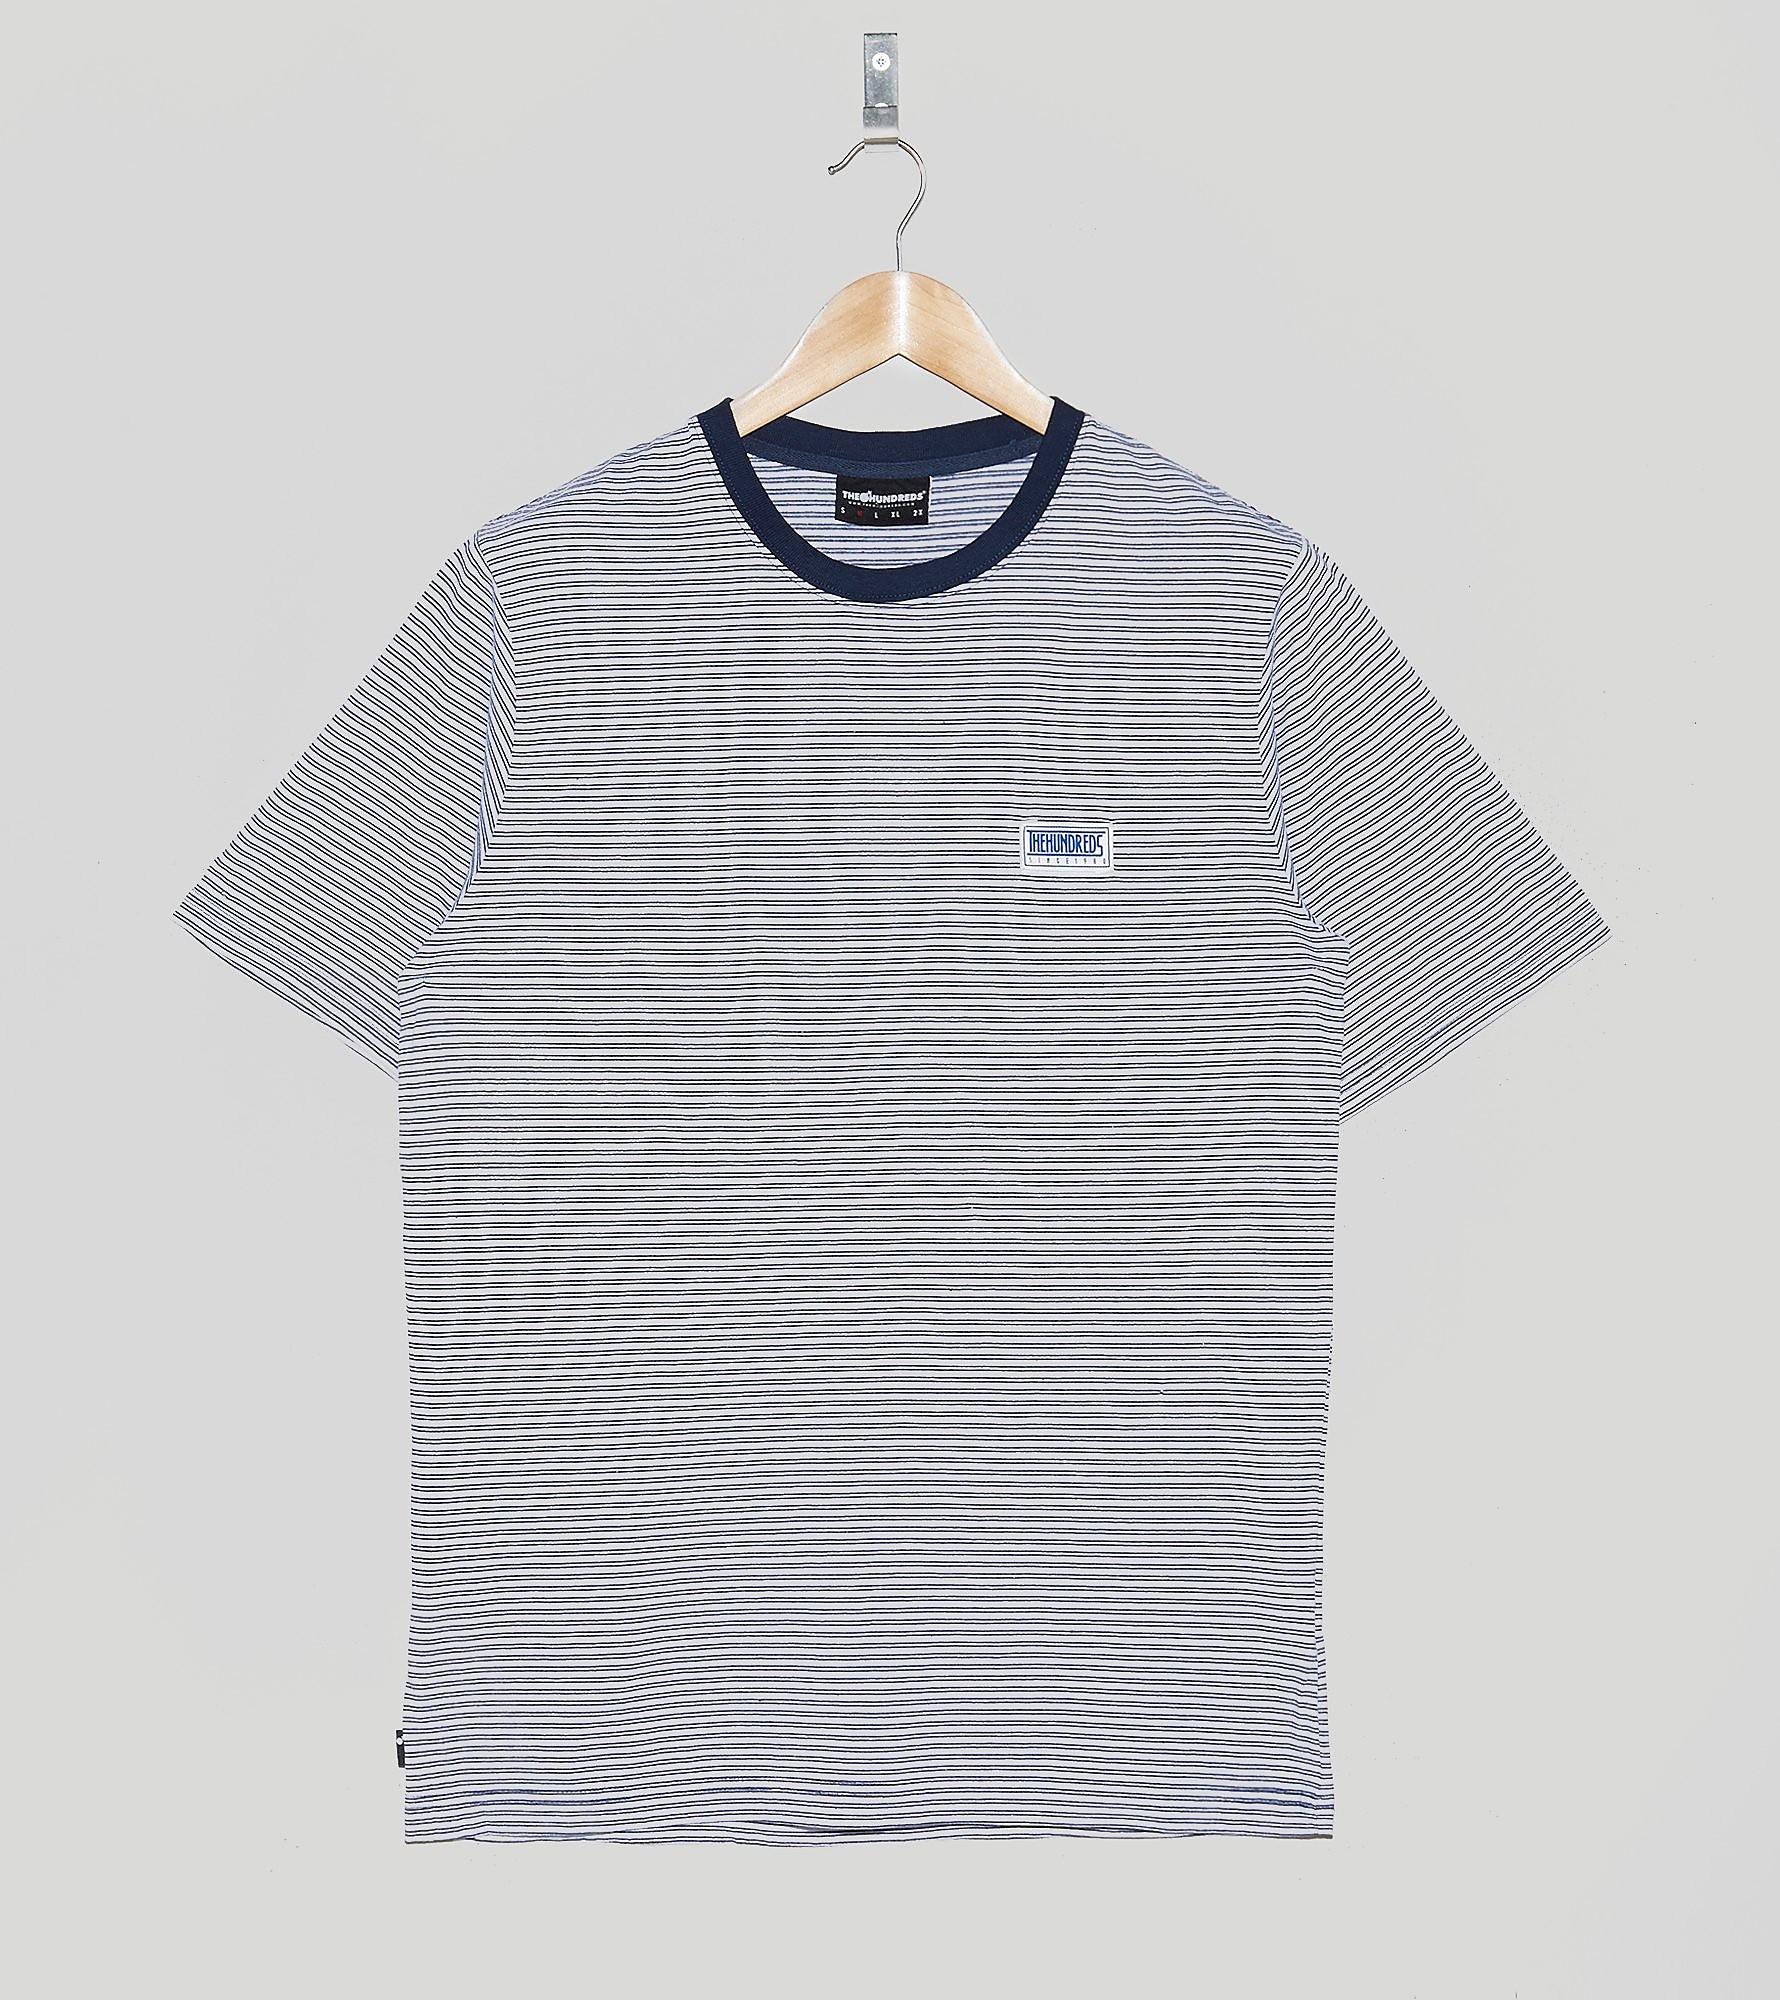 The Hundreds Marl Stripe Jersey T-Shirt